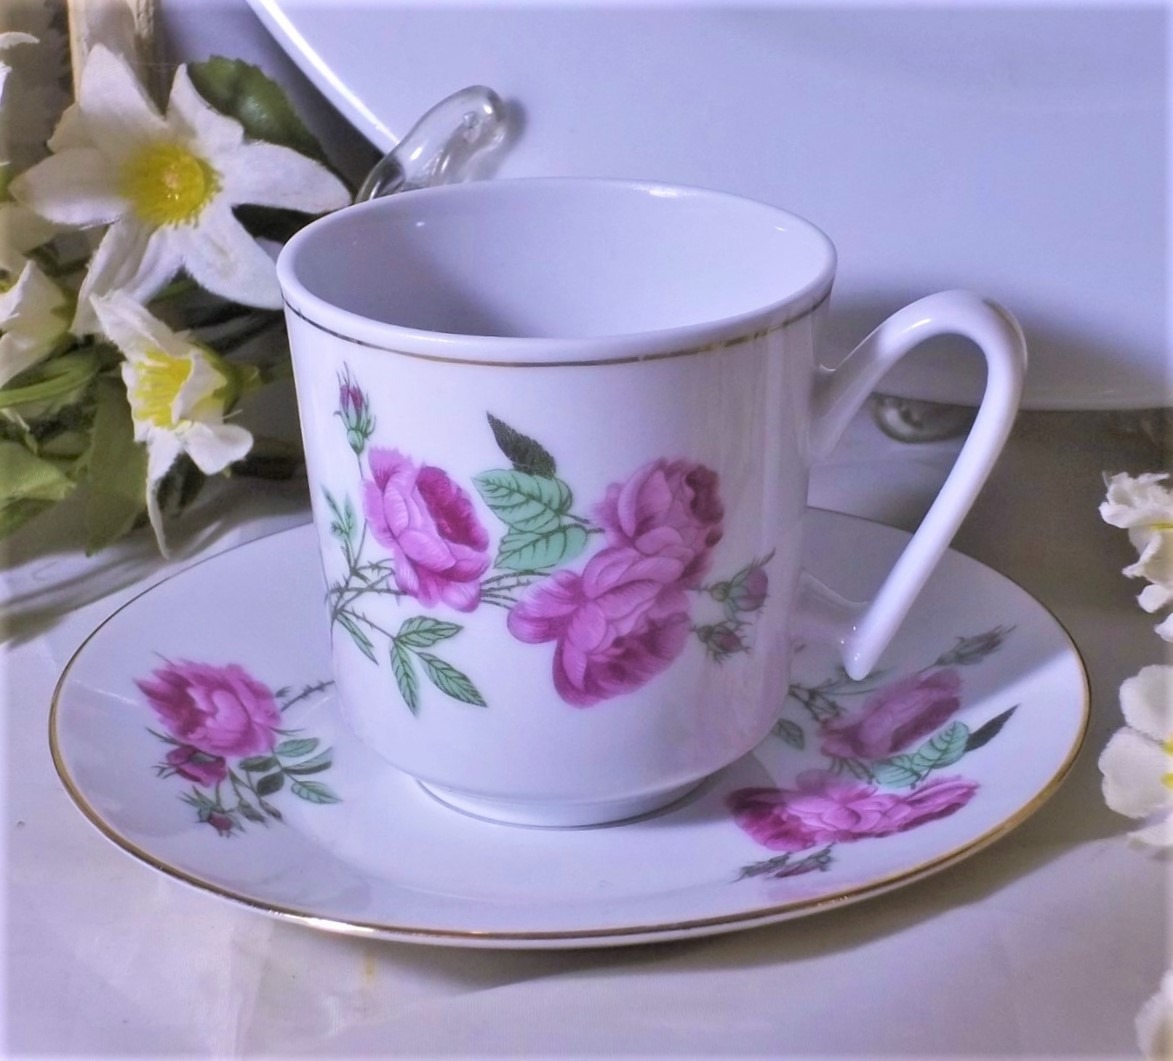 Antigua taza para caf de porcelana con rosas muy hermosa for Decoracion con tazas de cafe